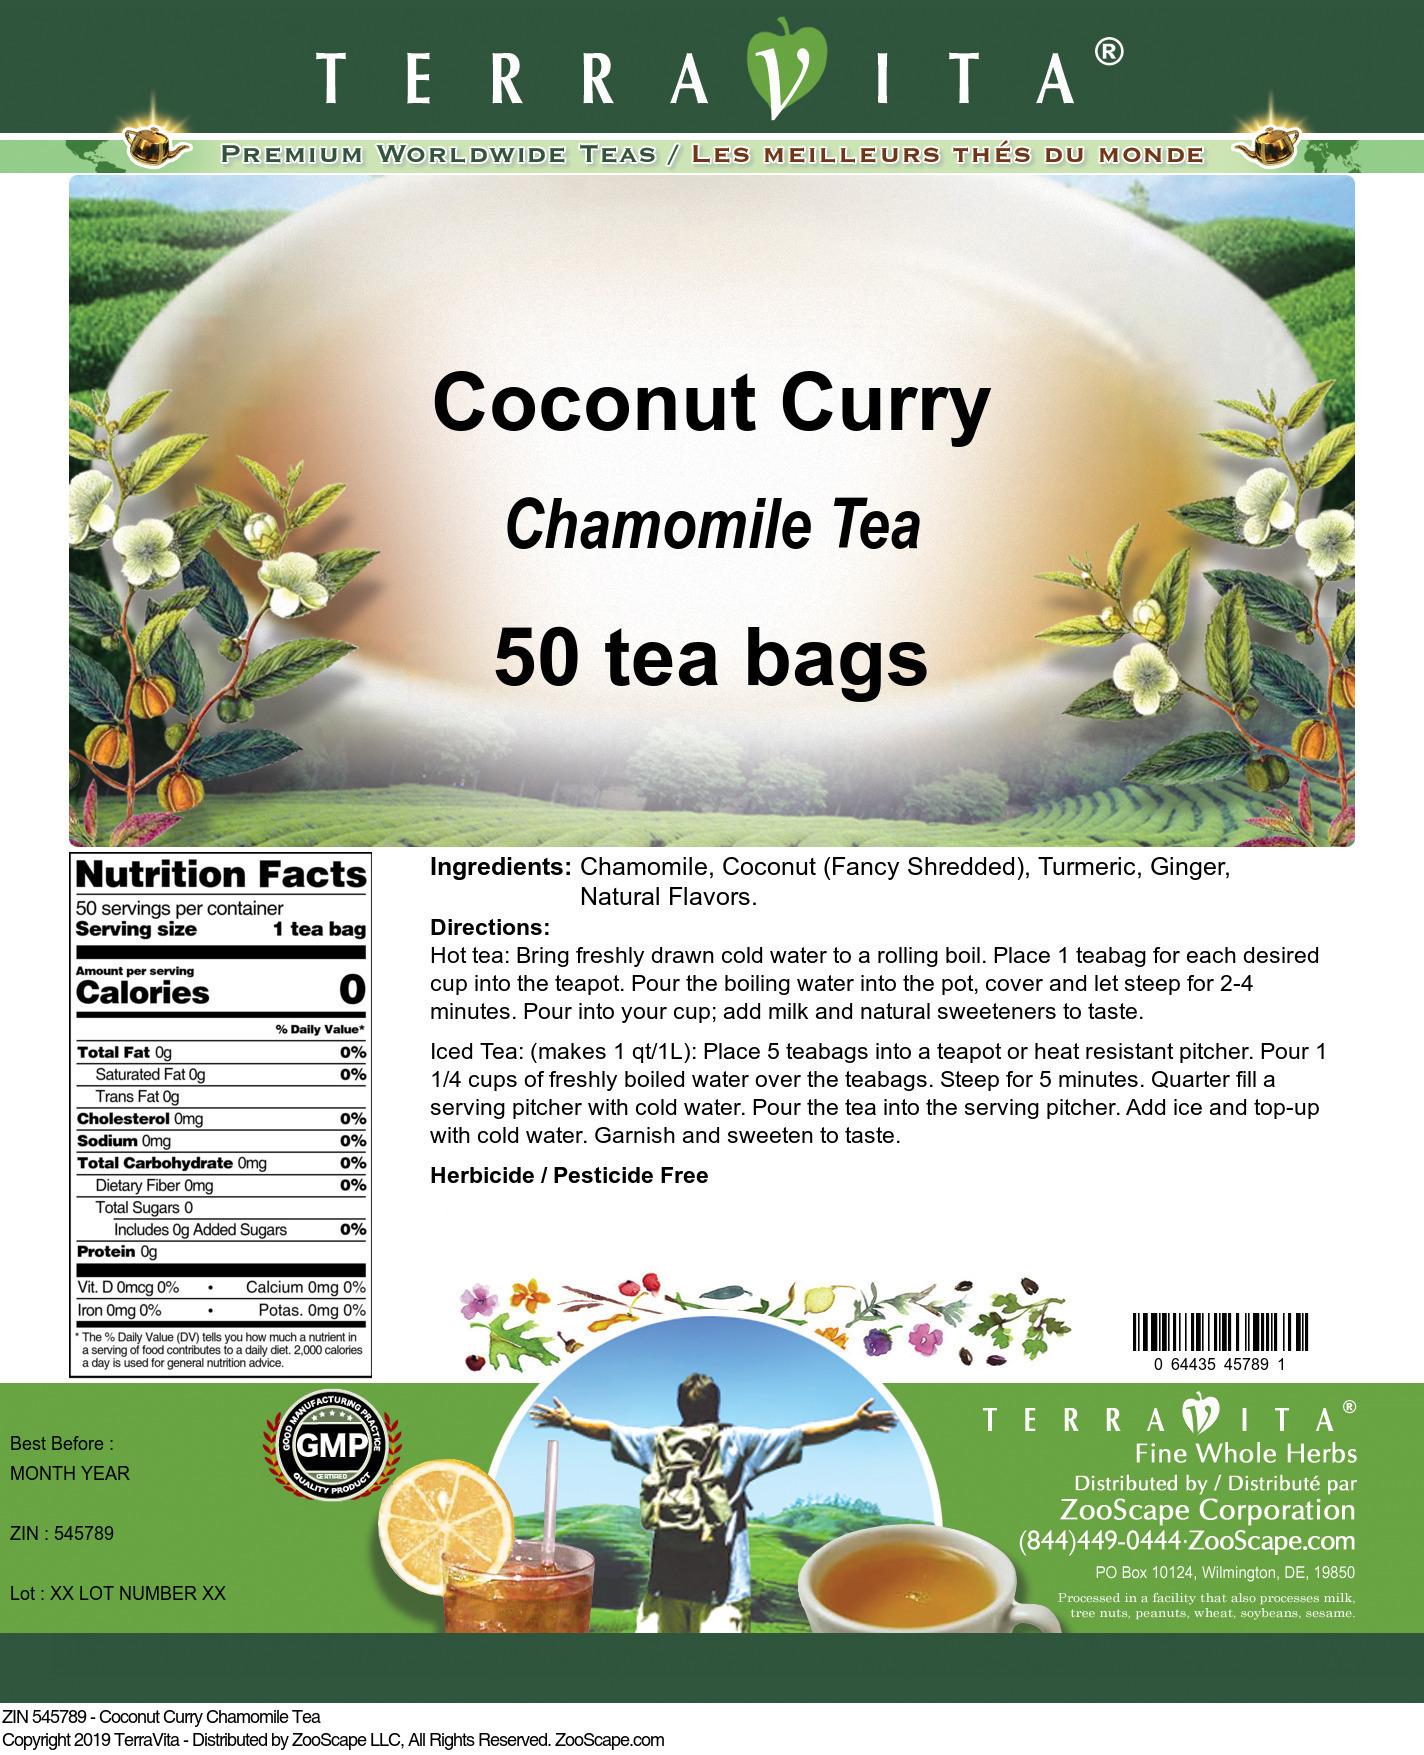 Coconut Curry Chamomile Tea